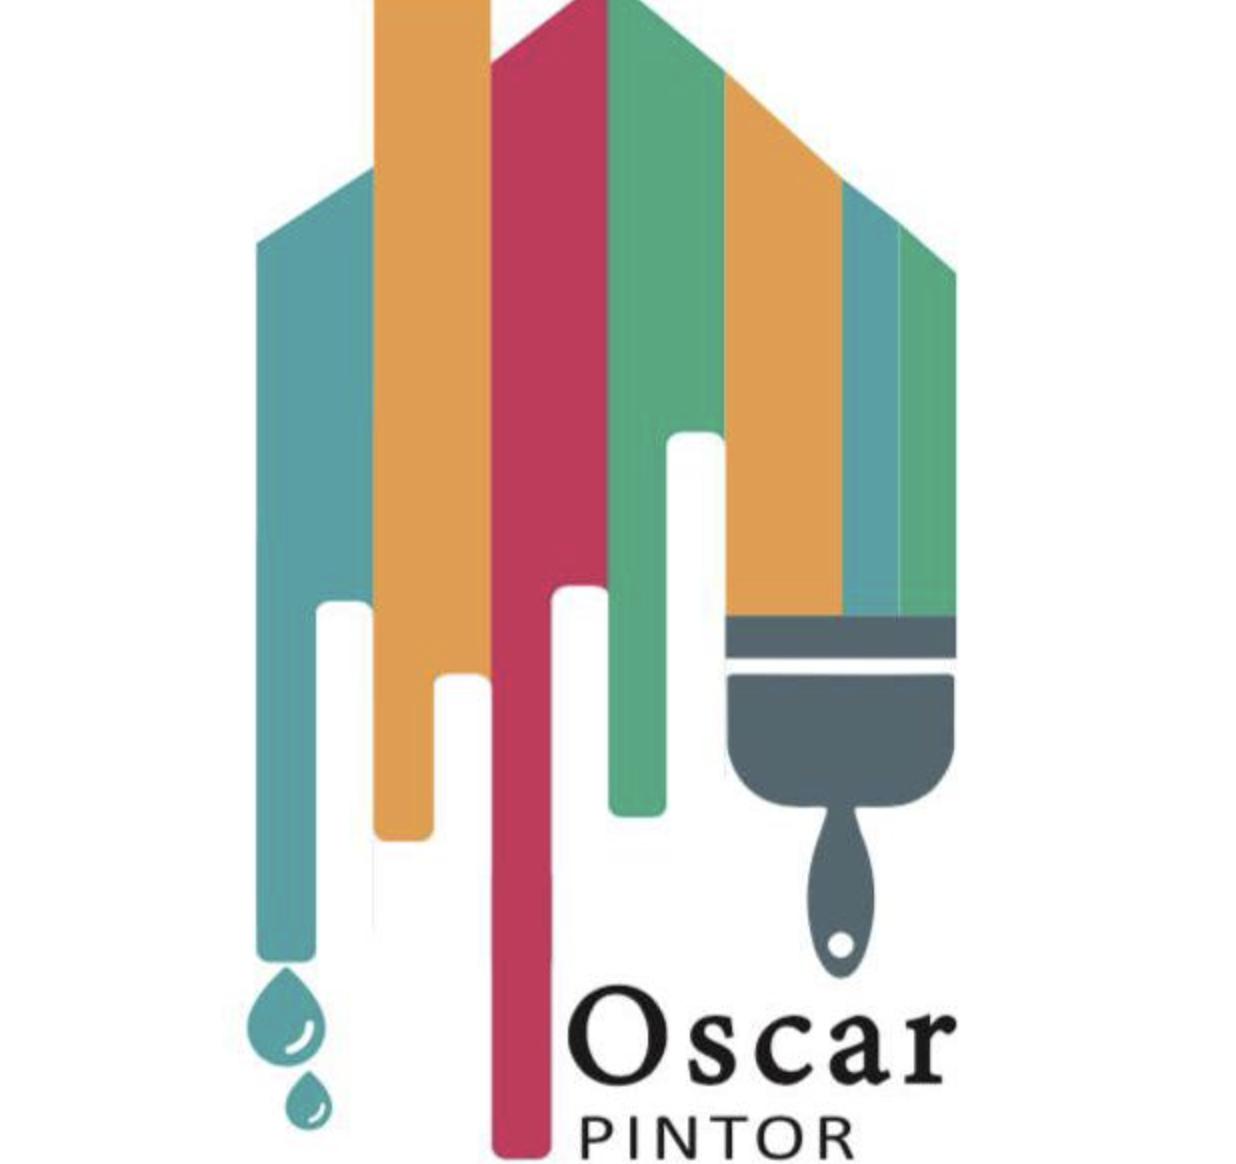 Logotip Oscar Pintor